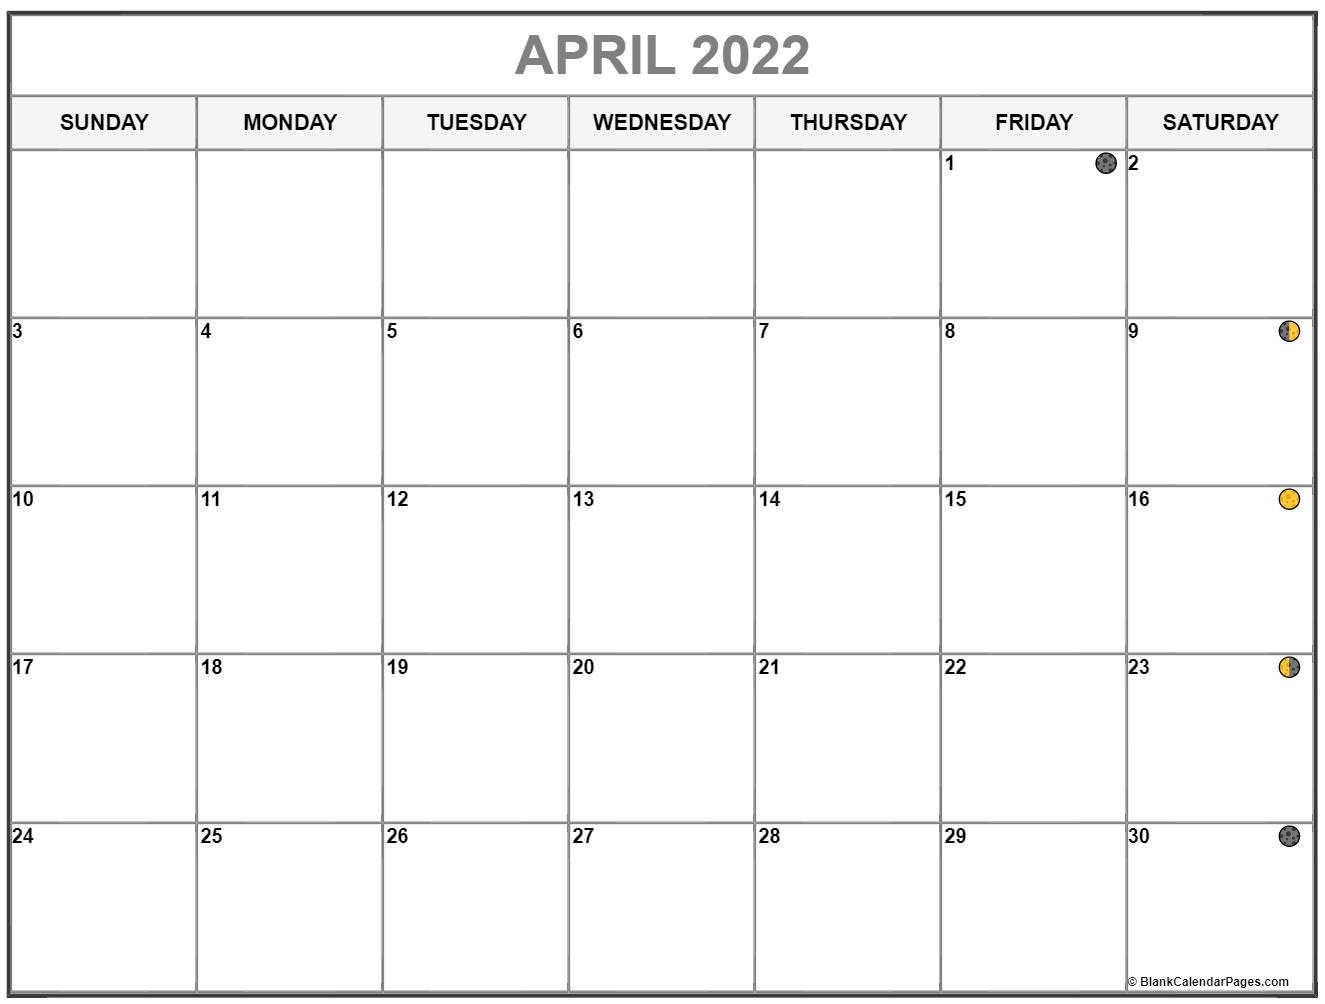 April 2022 Lunar Calendar   Moon Phase Calendar